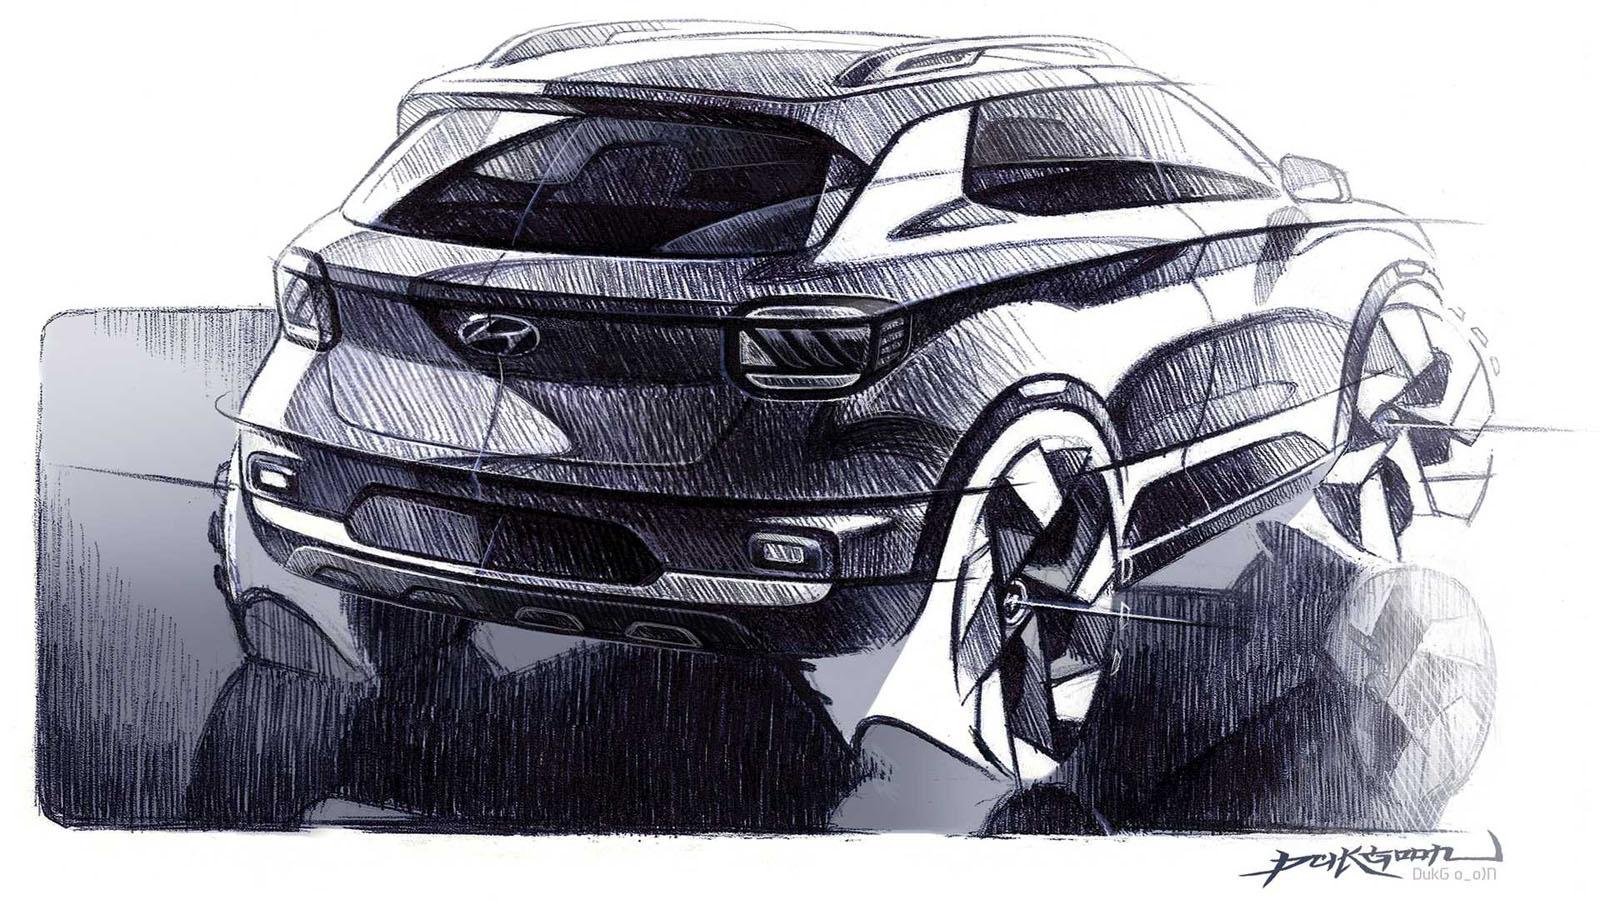 2020 Hyundai Venue Teaser Image Rear